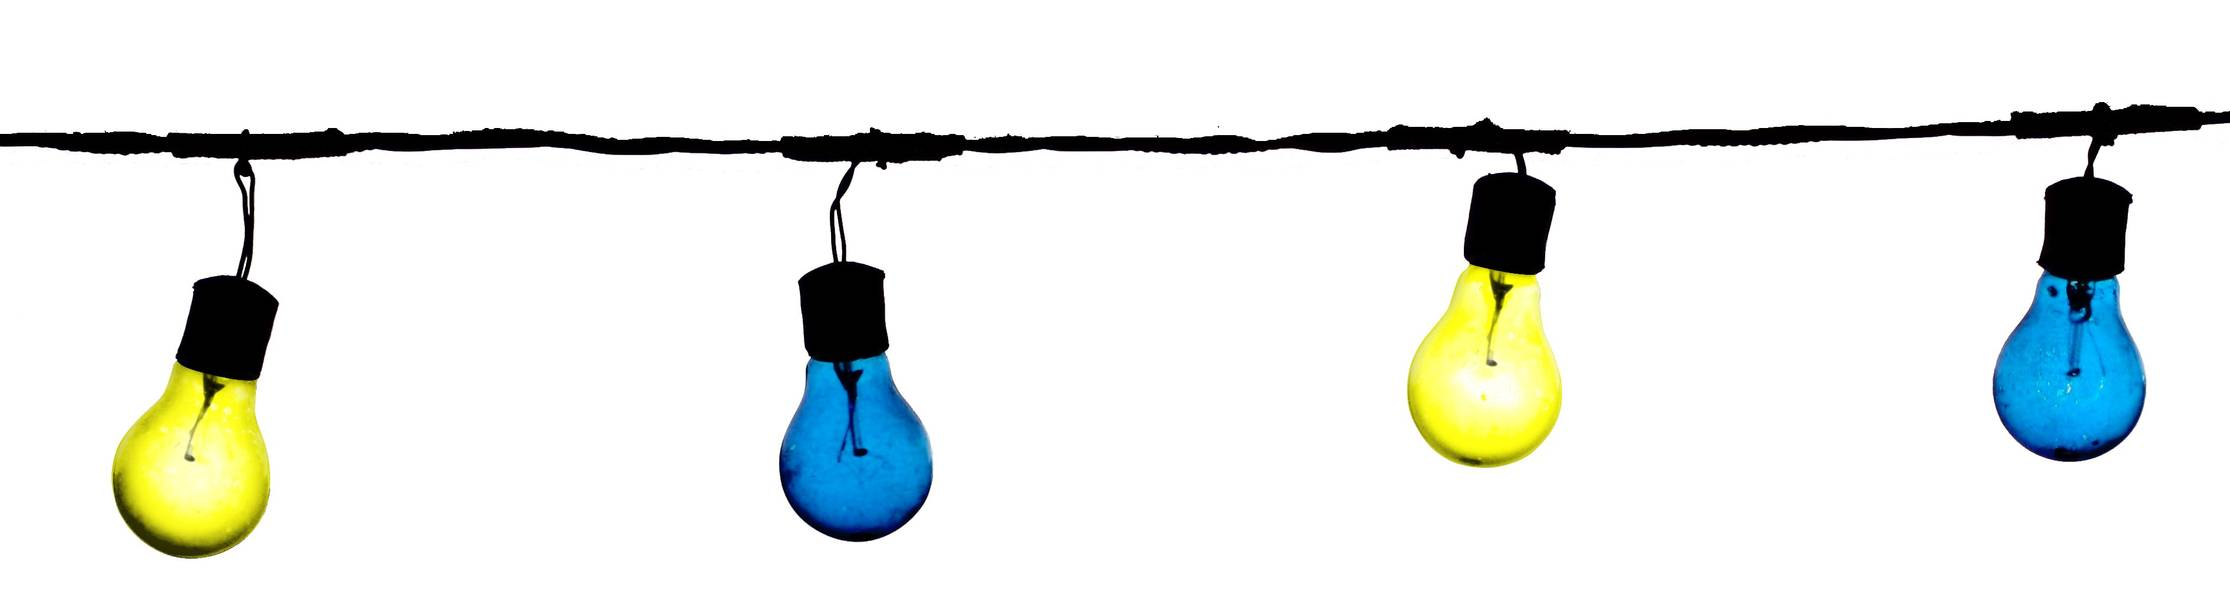 lampadine-blu-gialle-cut-wobinda-produzioni